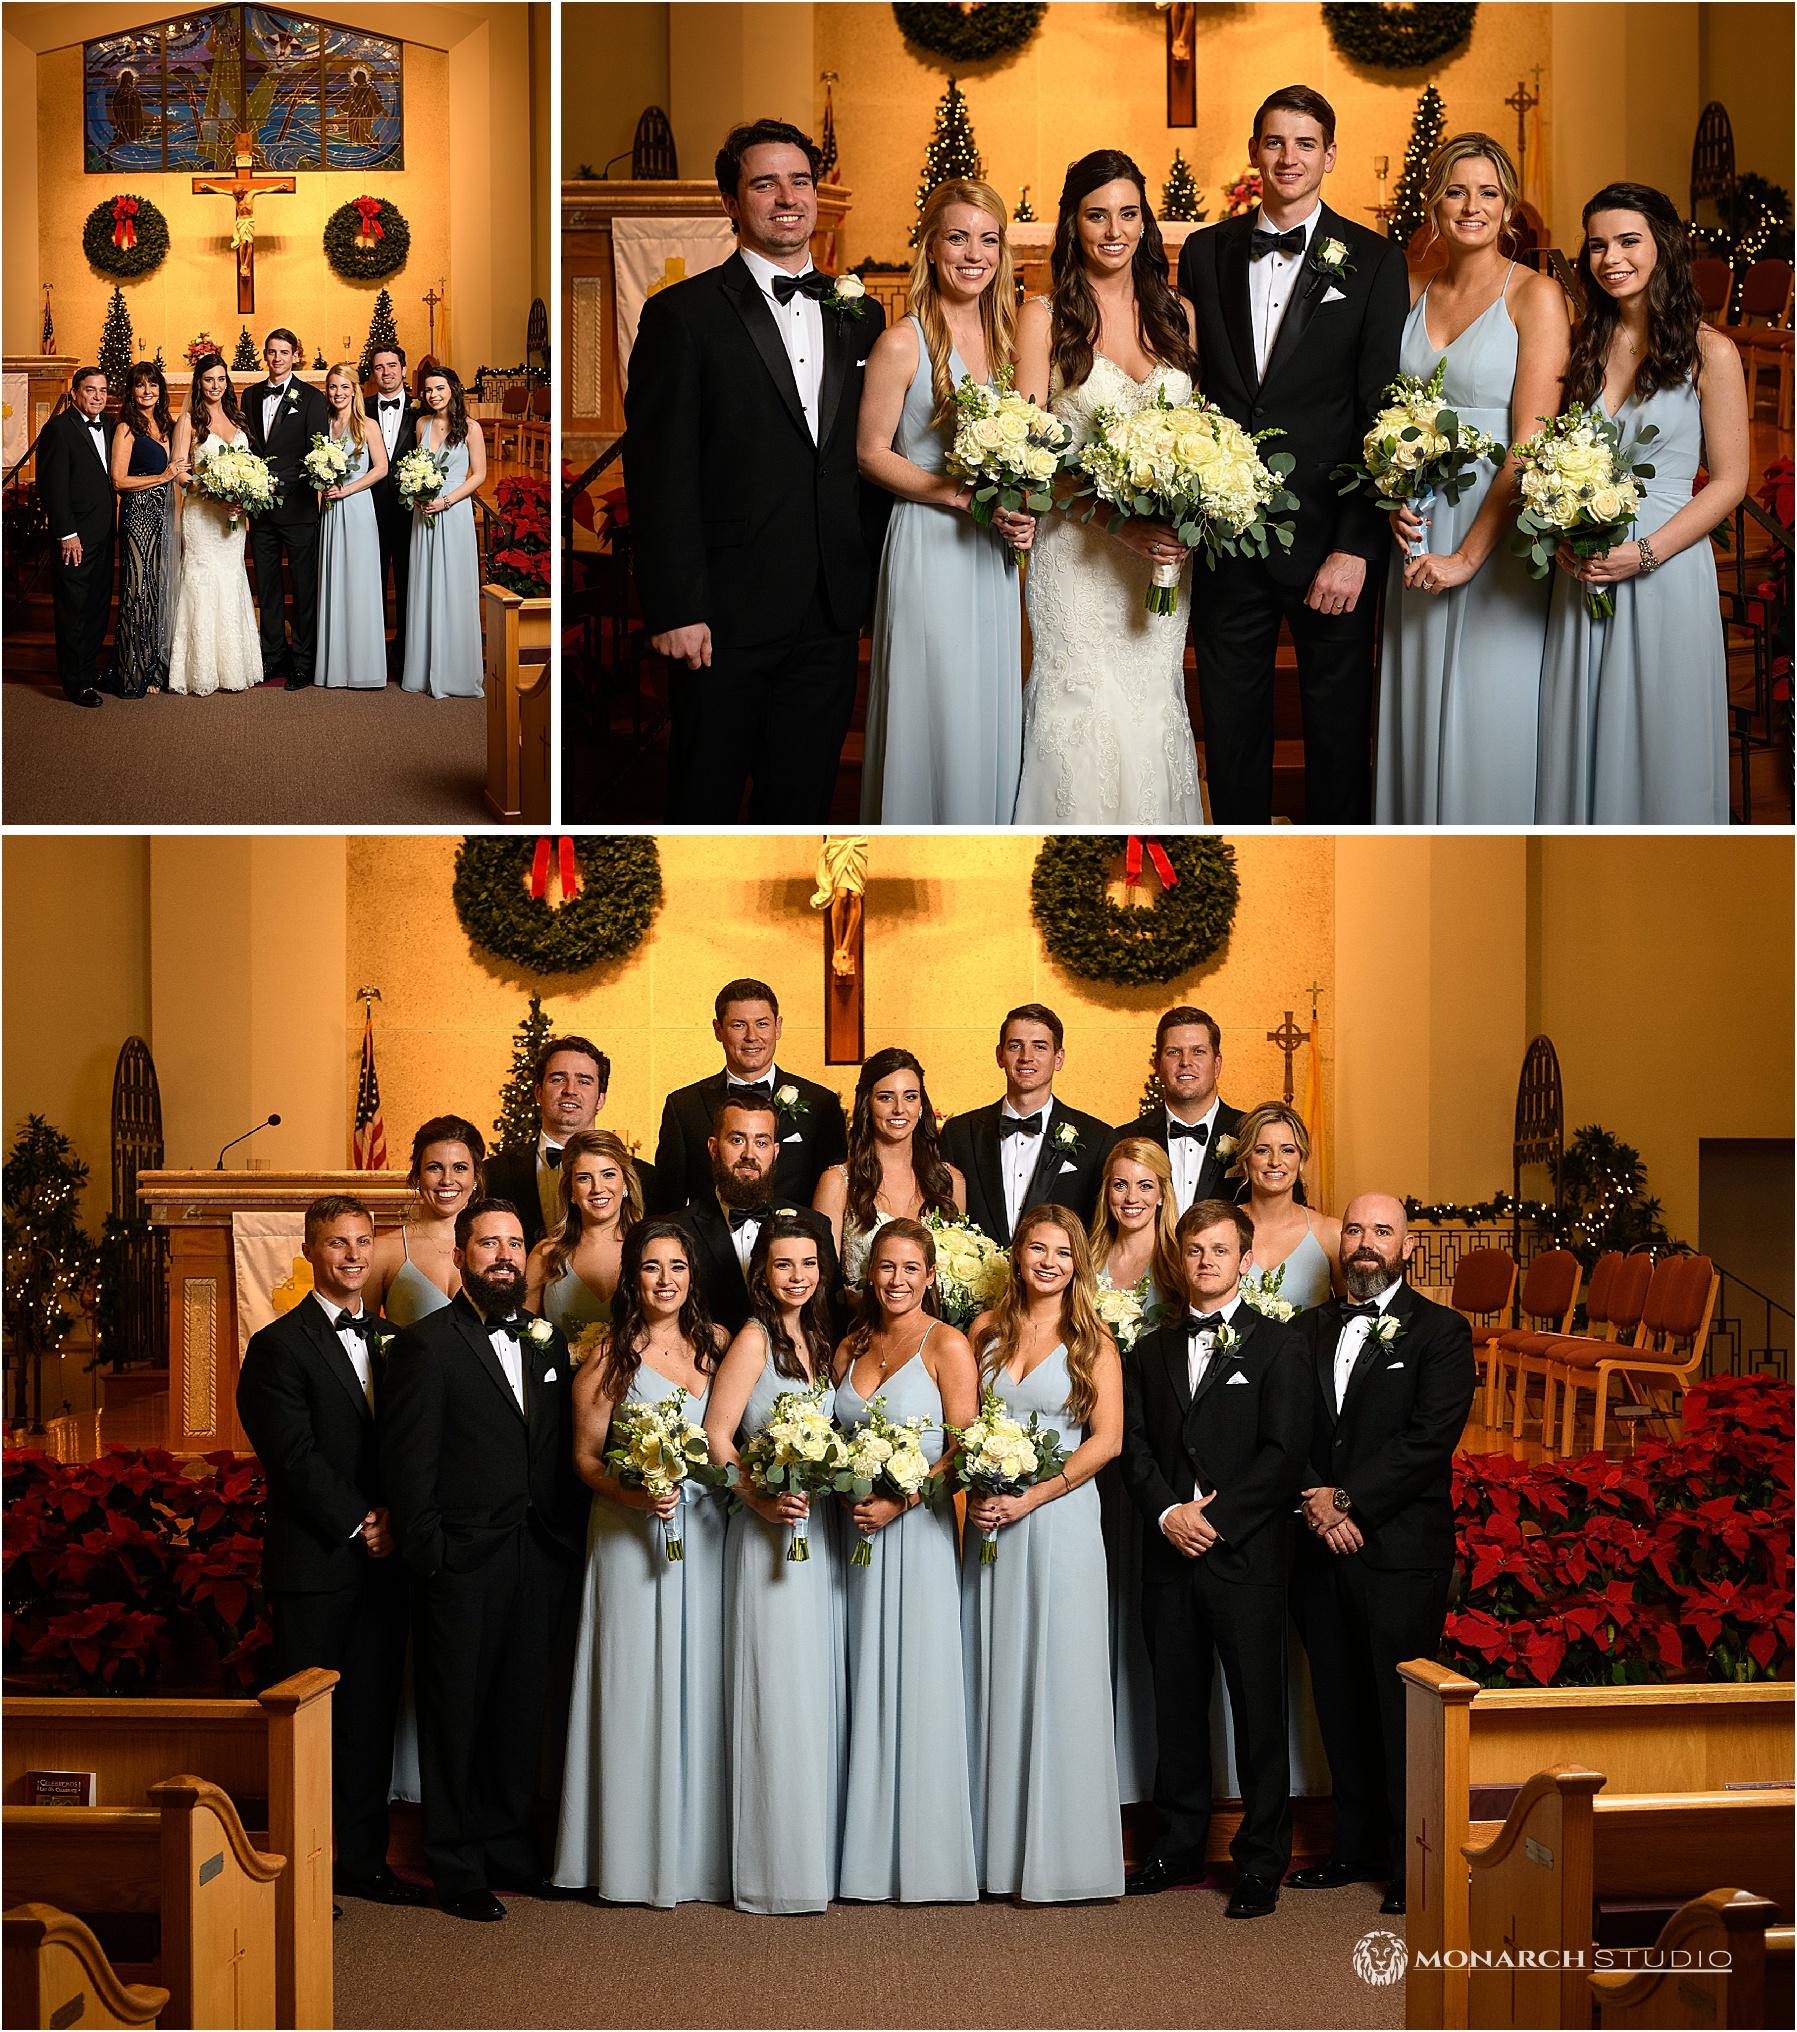 saint-augustine-wedding-photographer-treasury-057.jpg